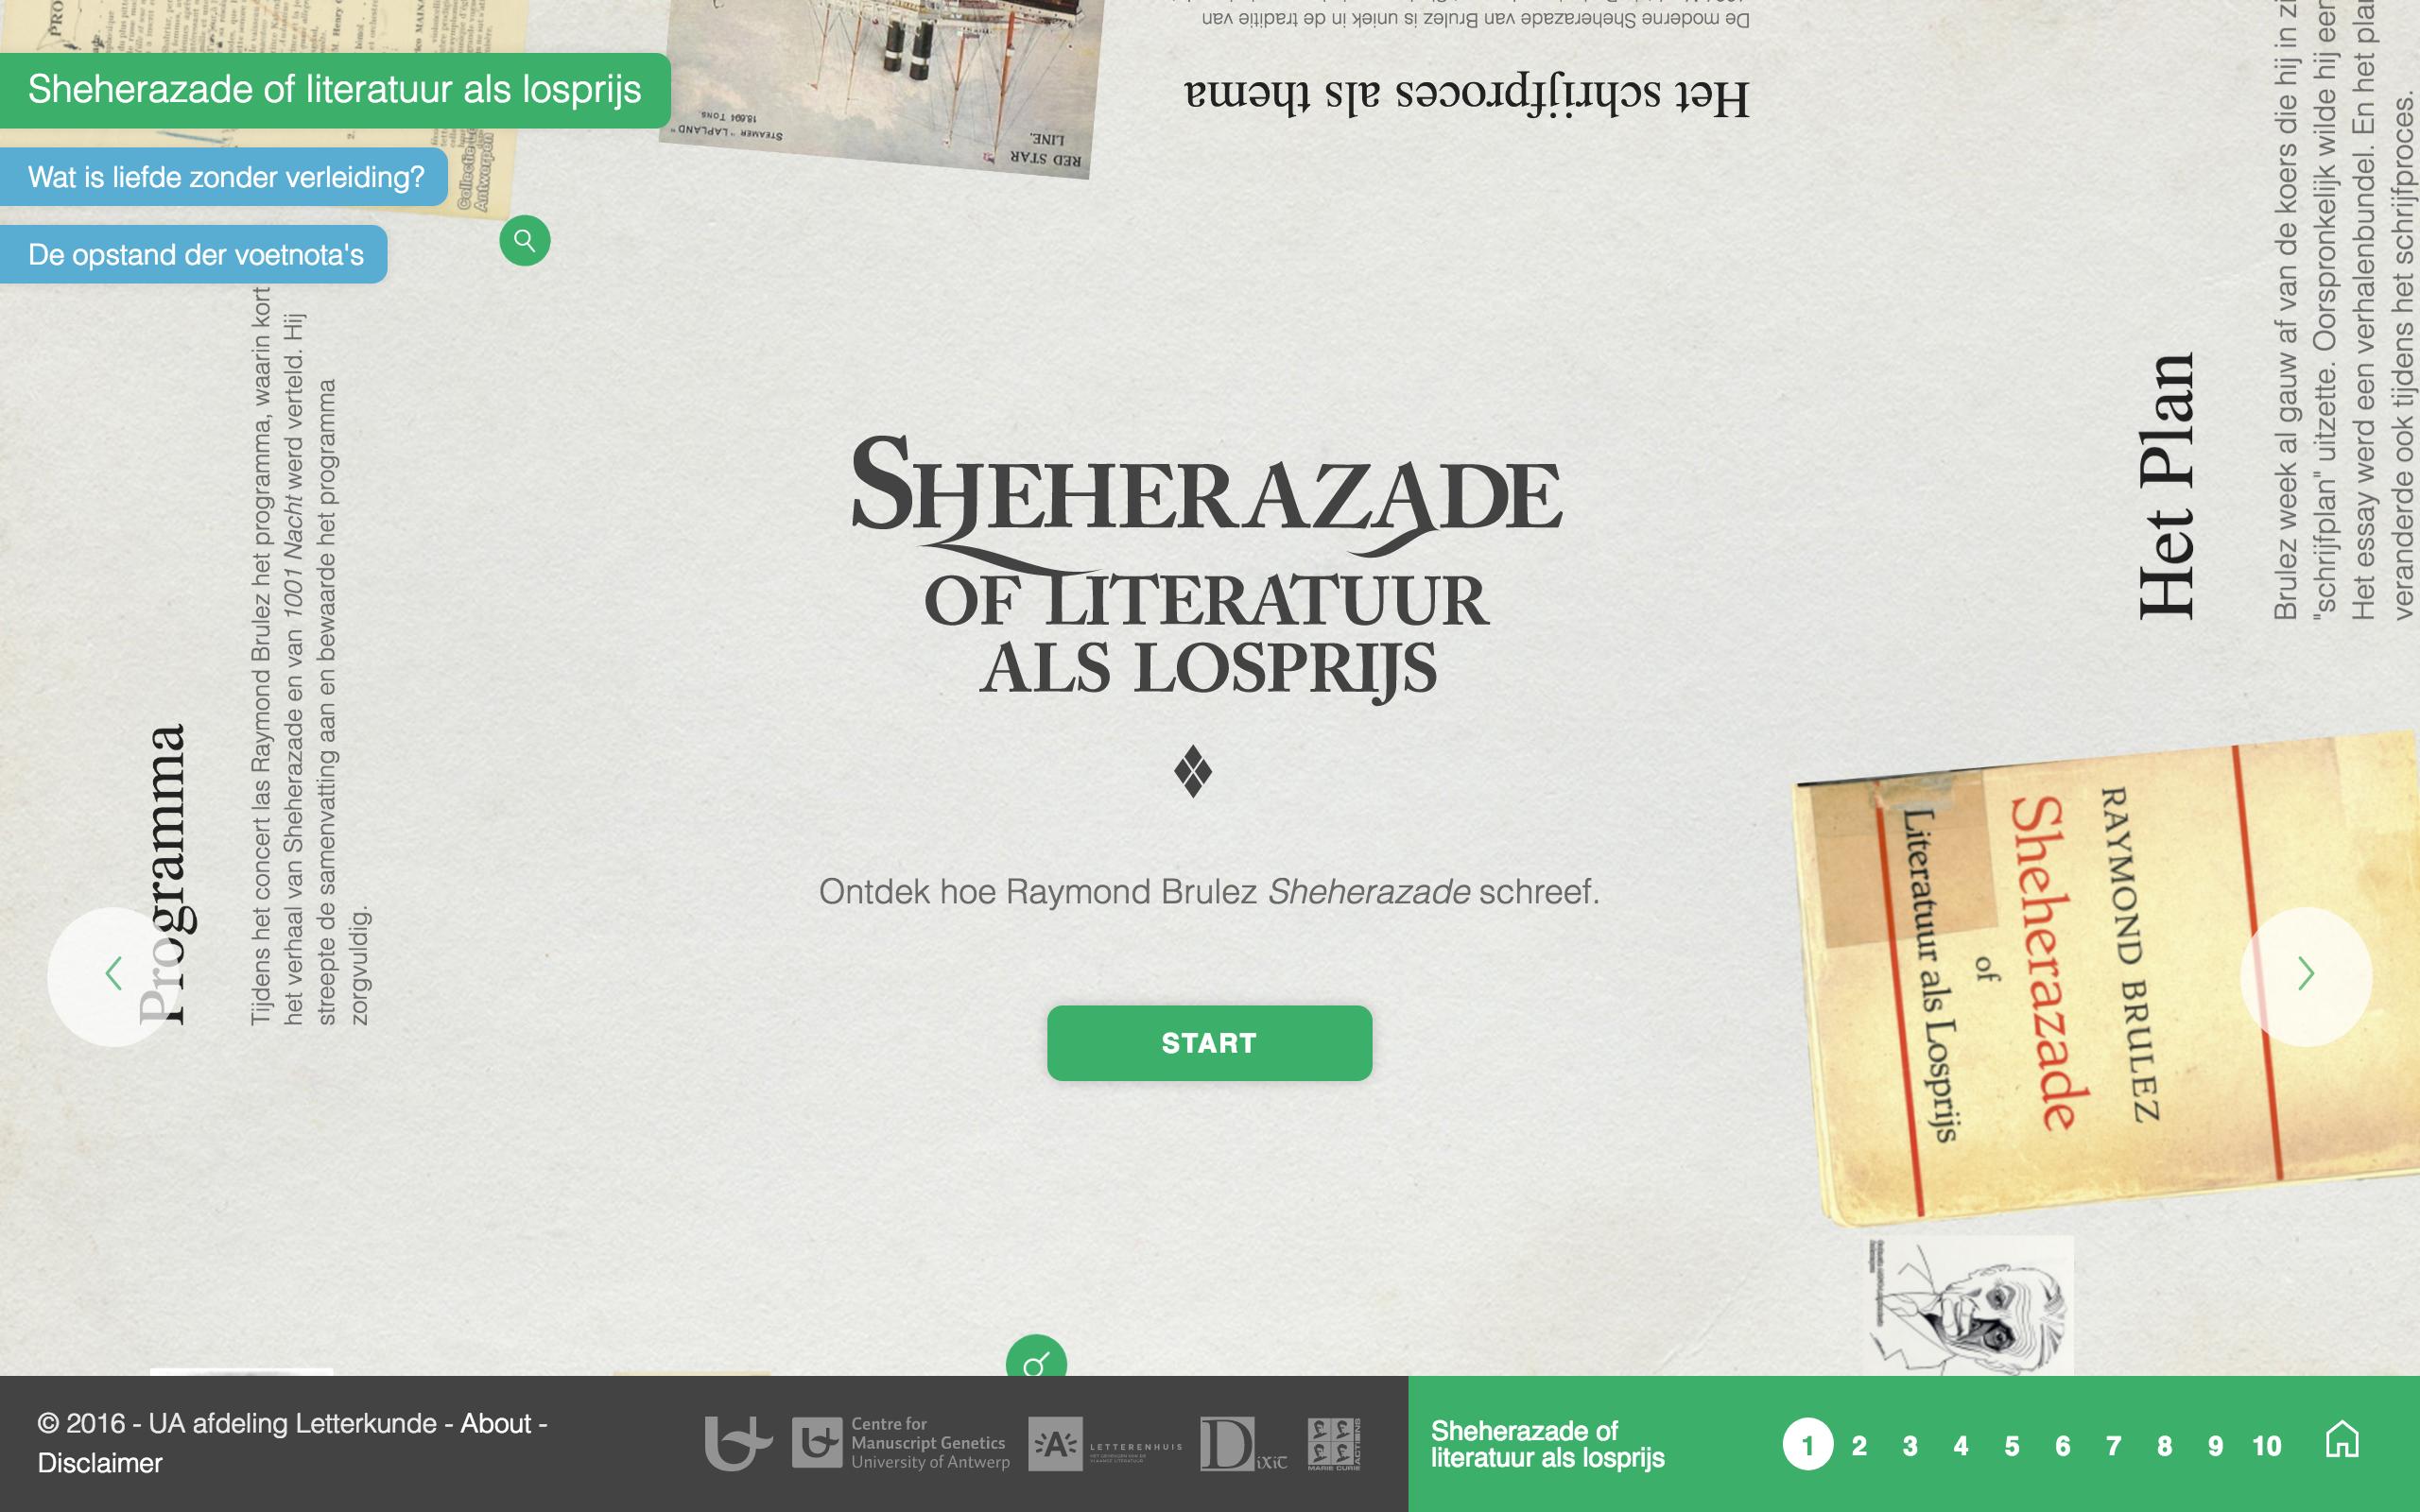 Sheherazade of Literatuur als Losprijs